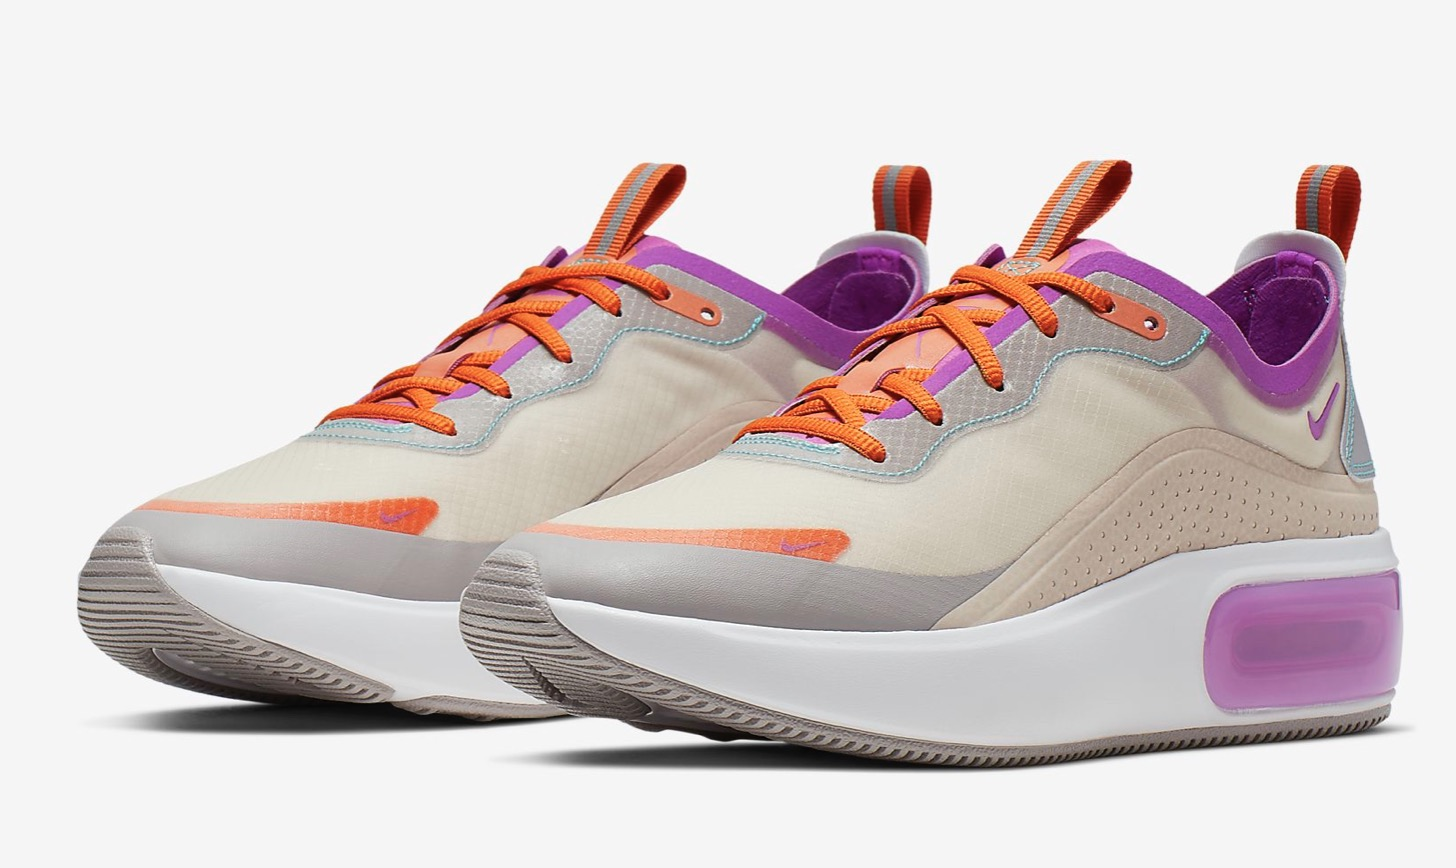 Nike Air Max DiaLight Orewood Brown/Starfish/Atmosphere Grey/Hyper Violet side view 1